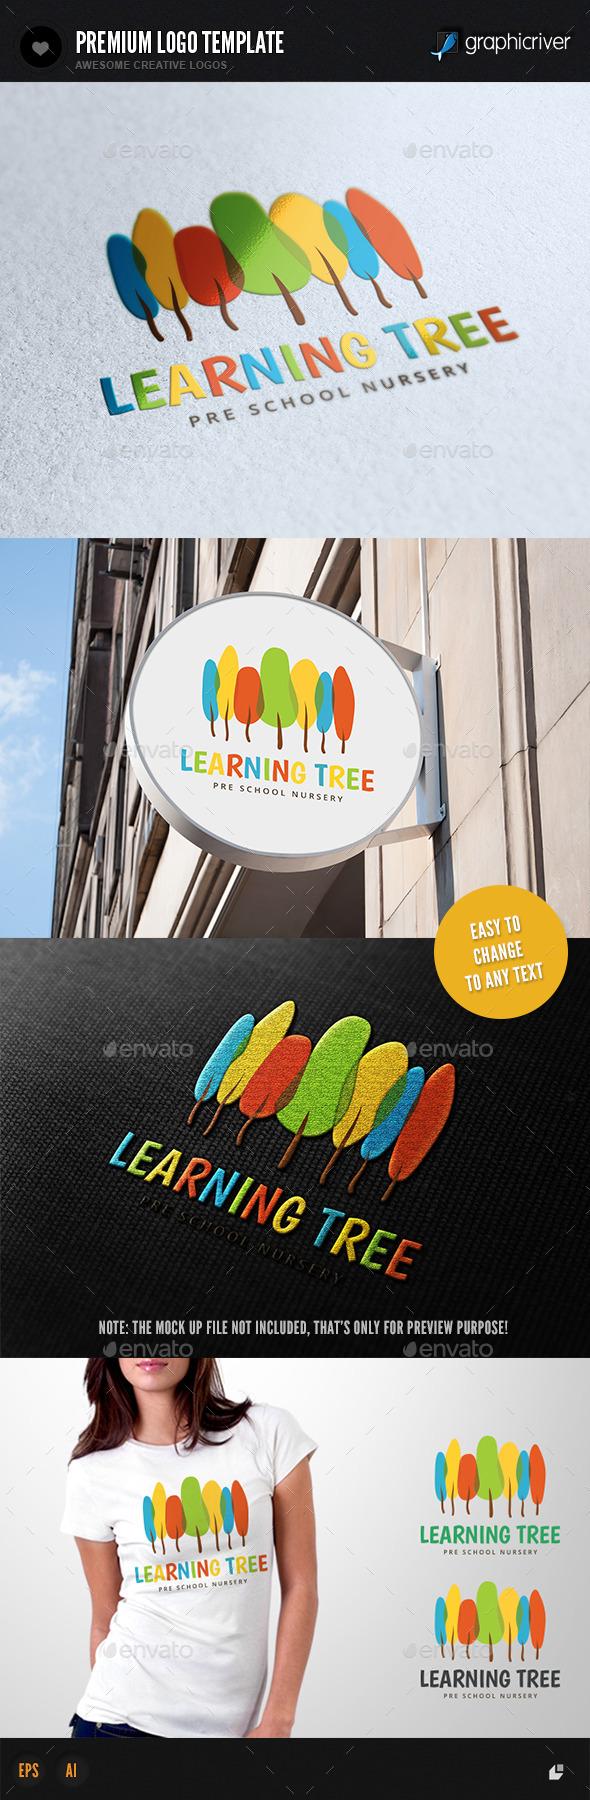 GraphicRiver Learning Tree Pre School Nursery 10784469